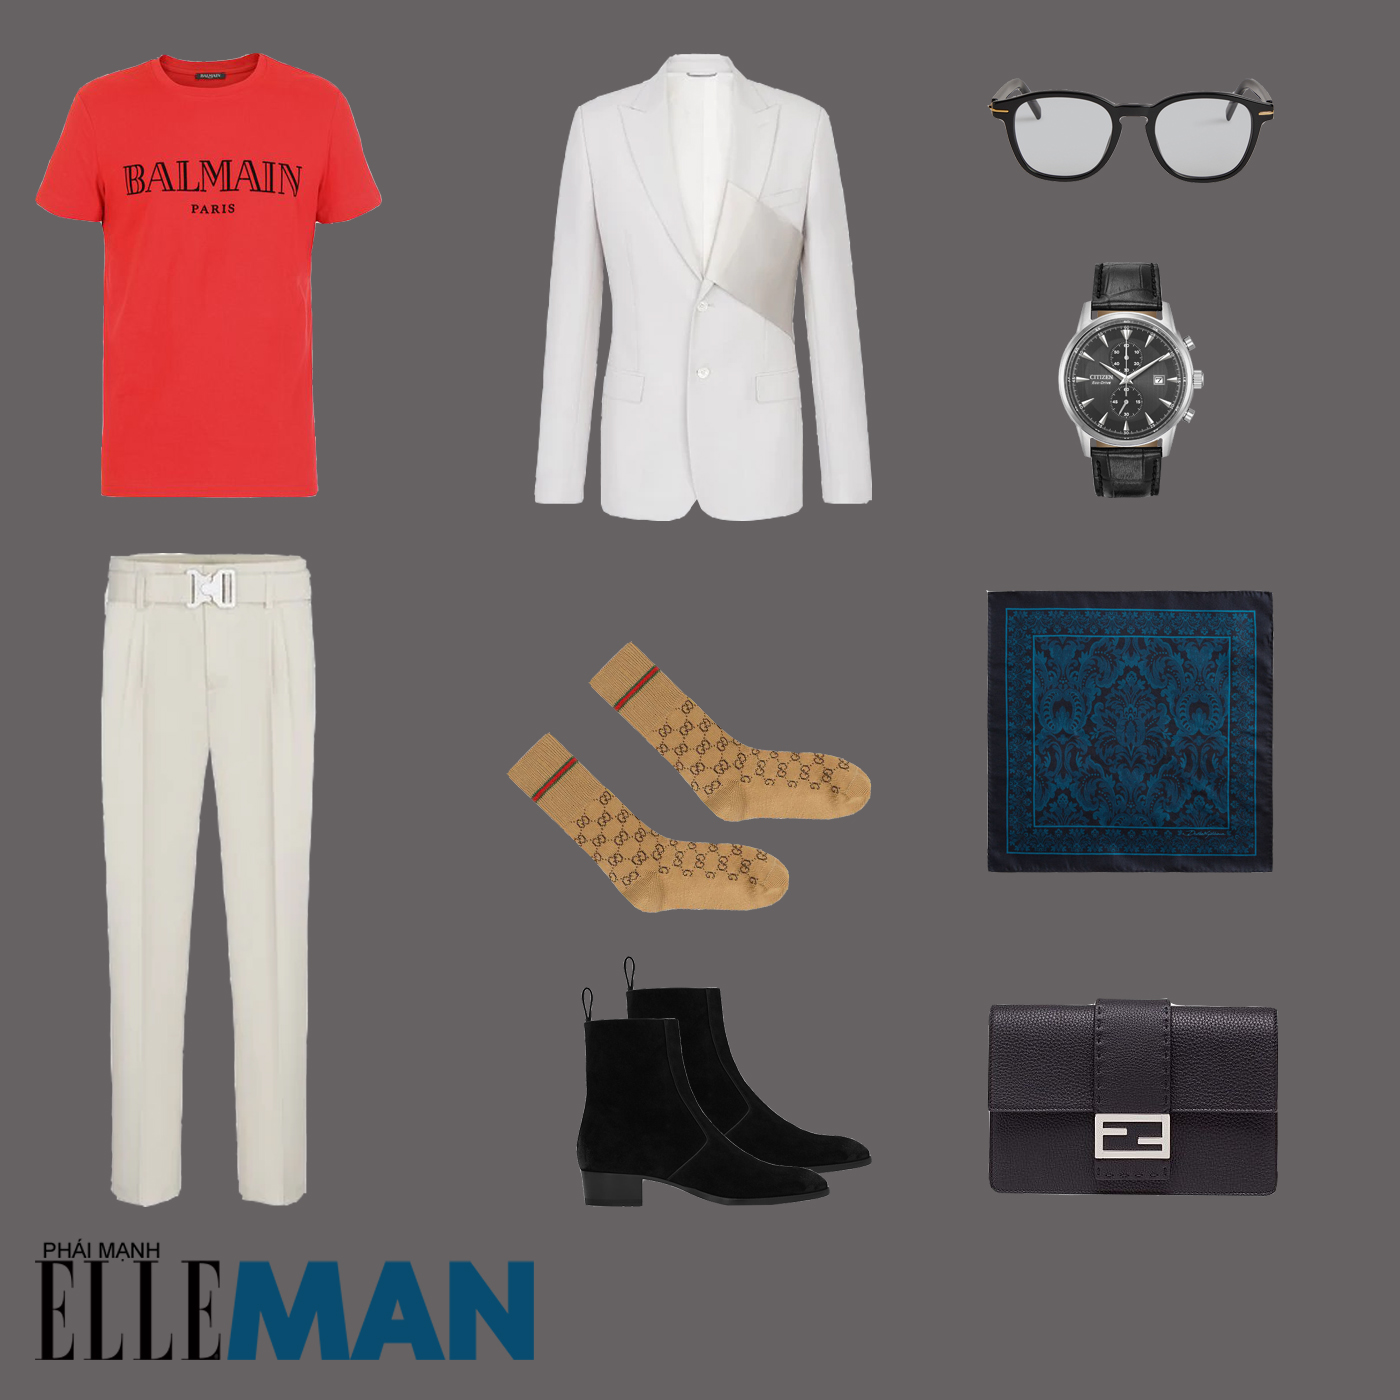 outfit 5 - phối đồ phong cách smart-casual